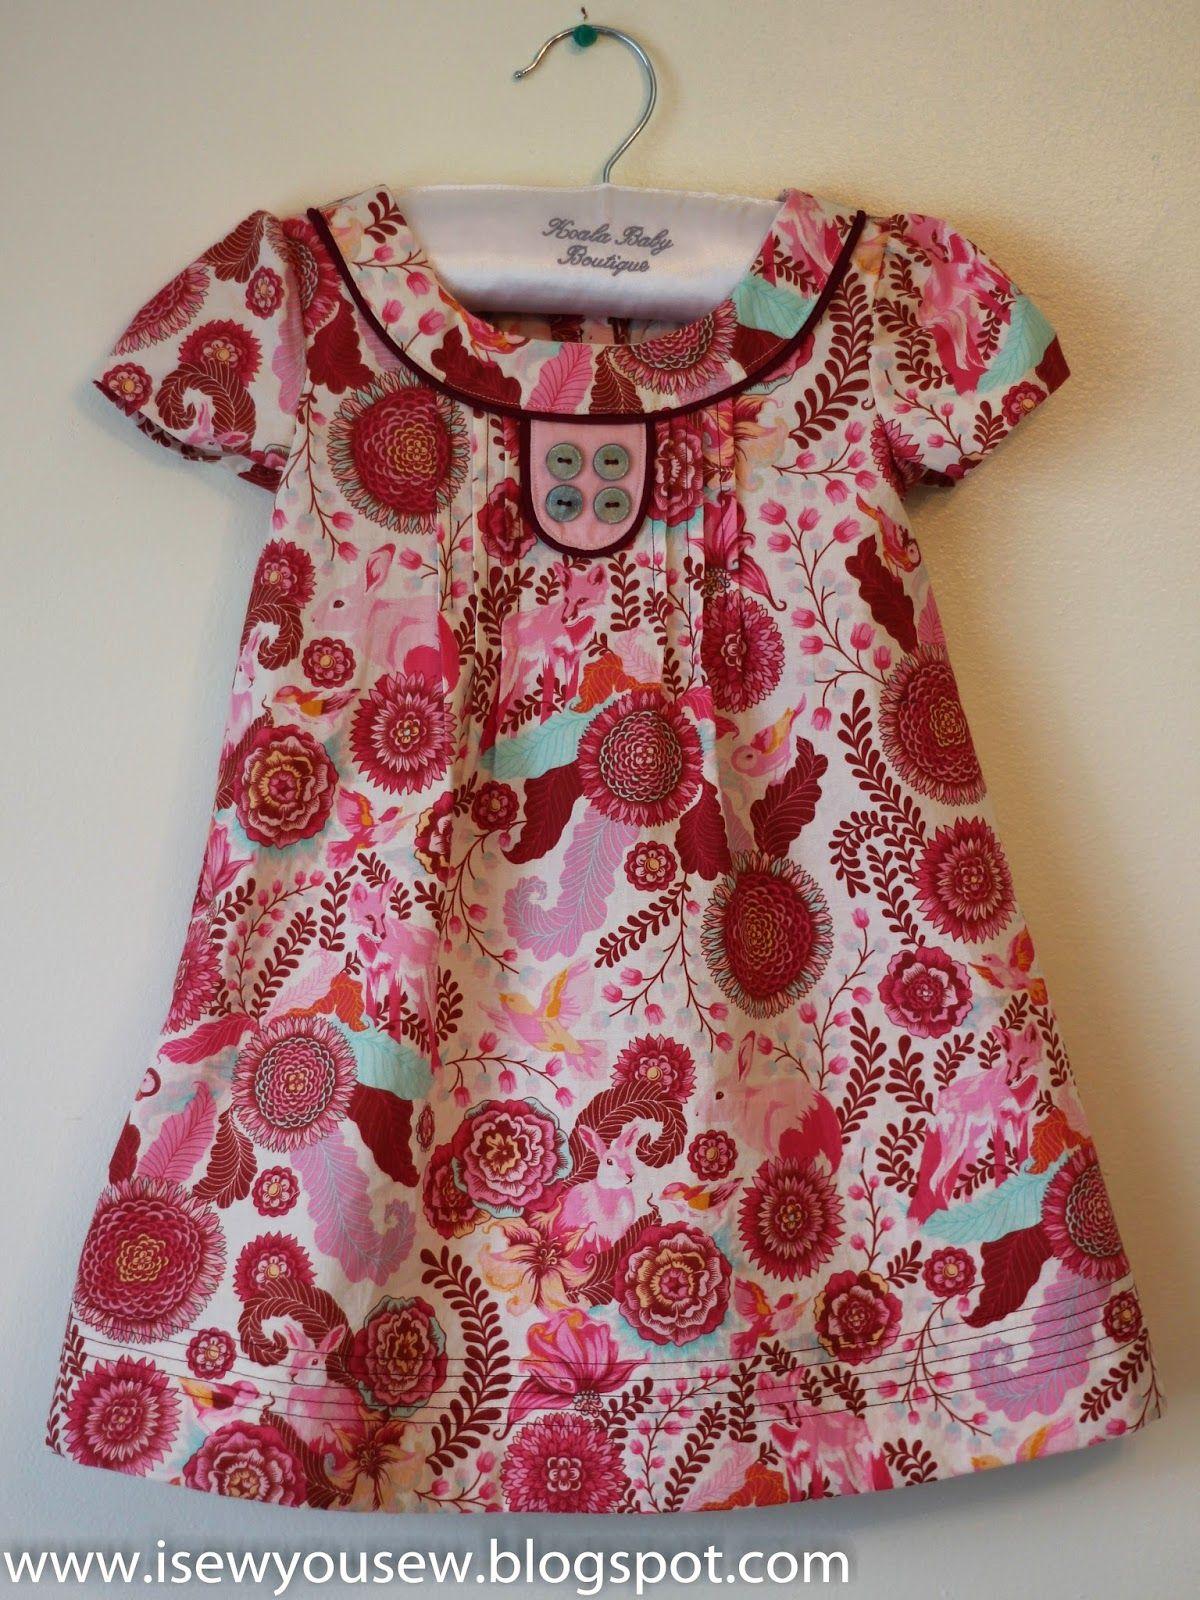 I Sew, You Sew Easter Dress 4.0 Easter dress, Little